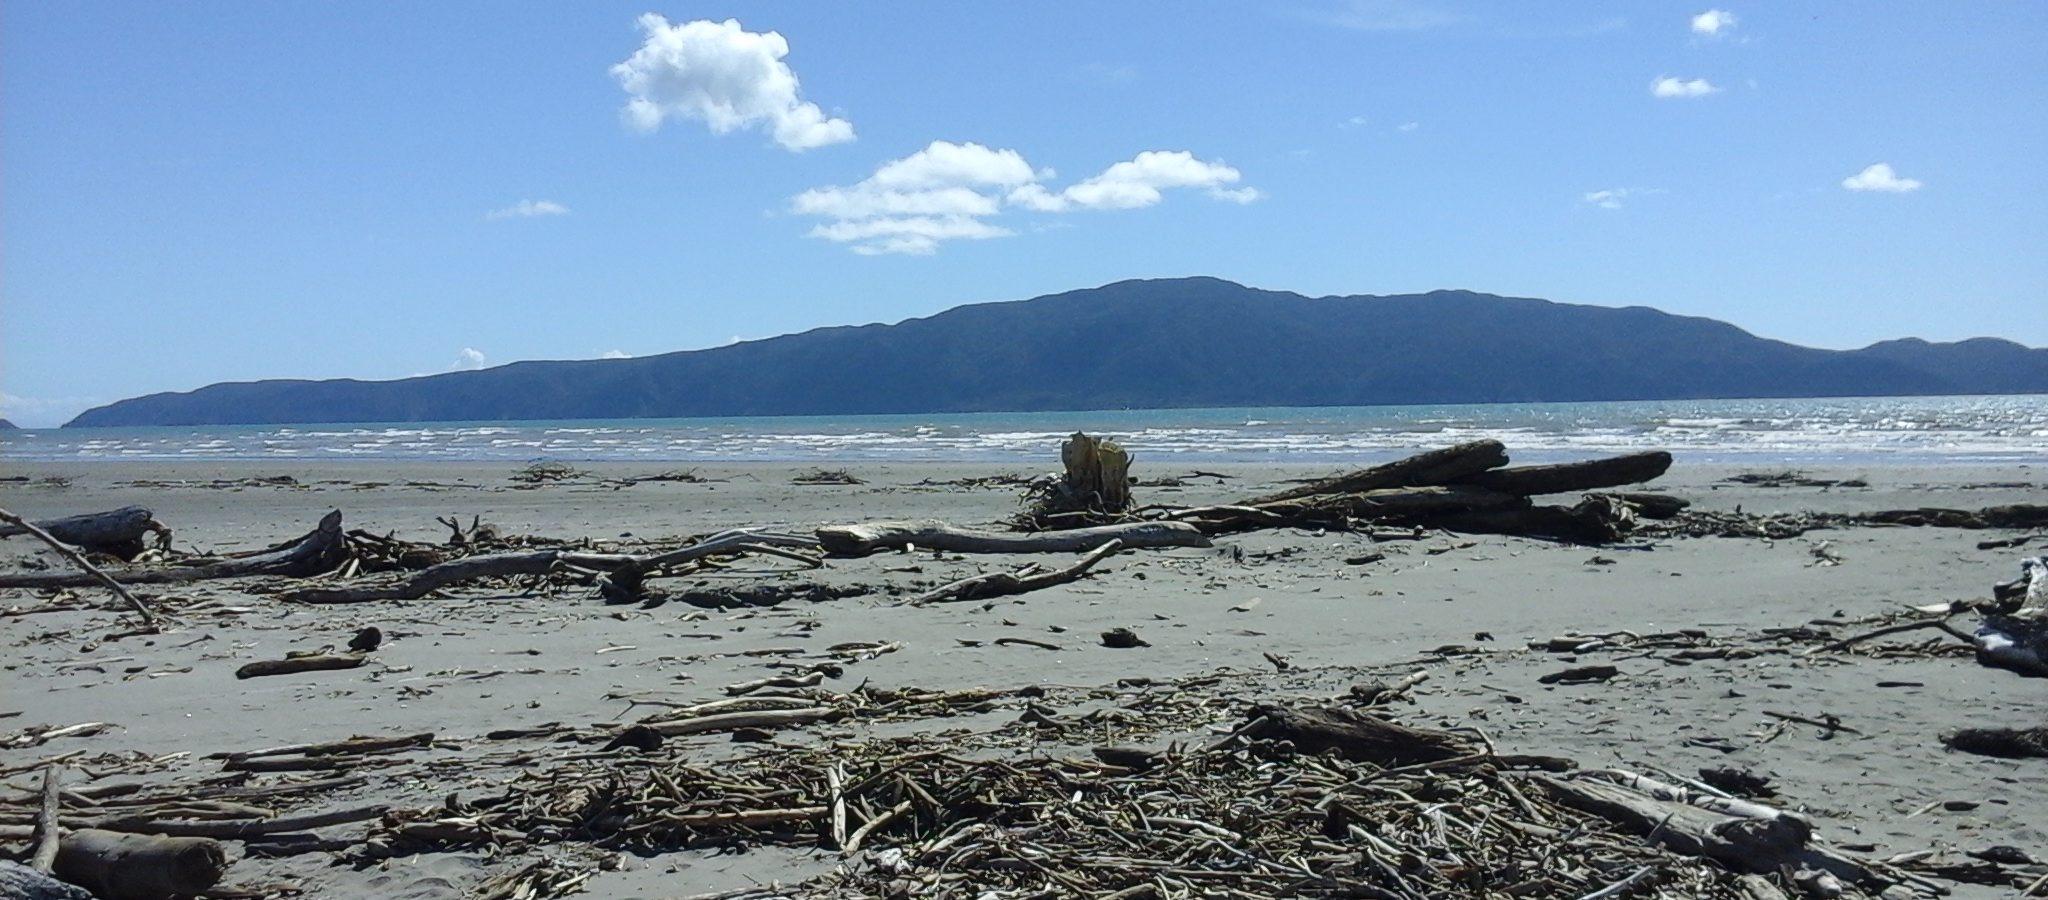 Day 76, Te Araroa, New Zealand